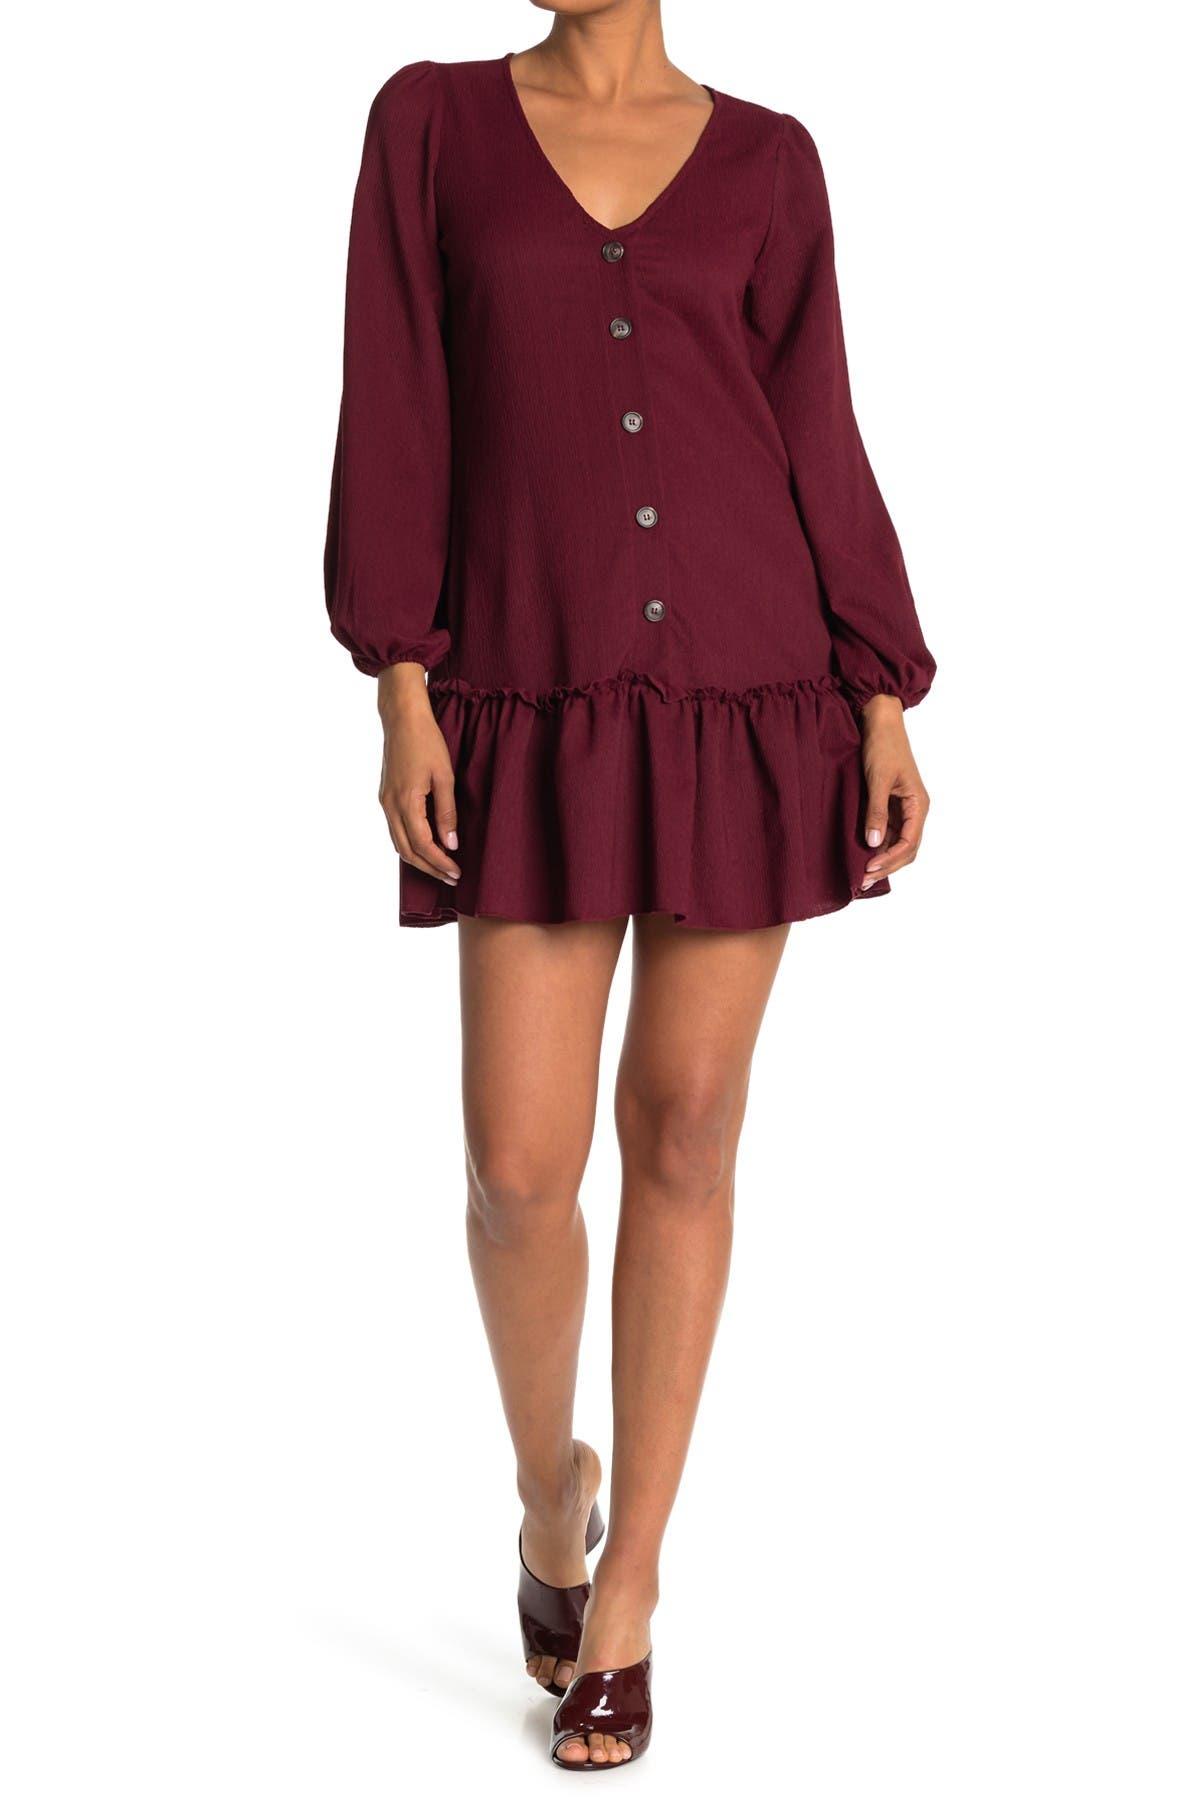 Image of KENEDIK Ruffle Hem Crinkle Button Dress